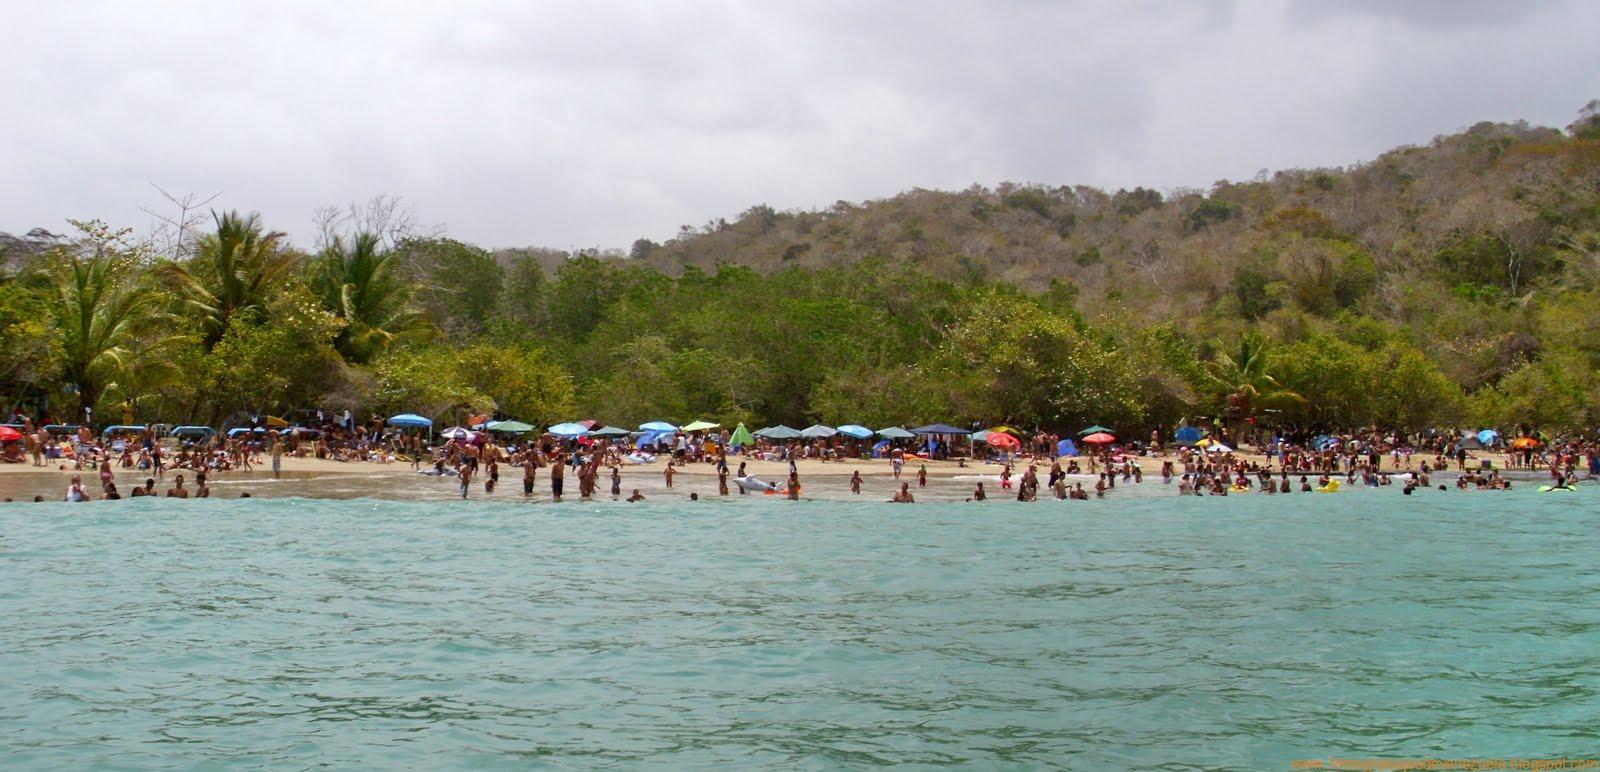 The beach morrocoy cayo juanes venezuela sexy party - 2 10